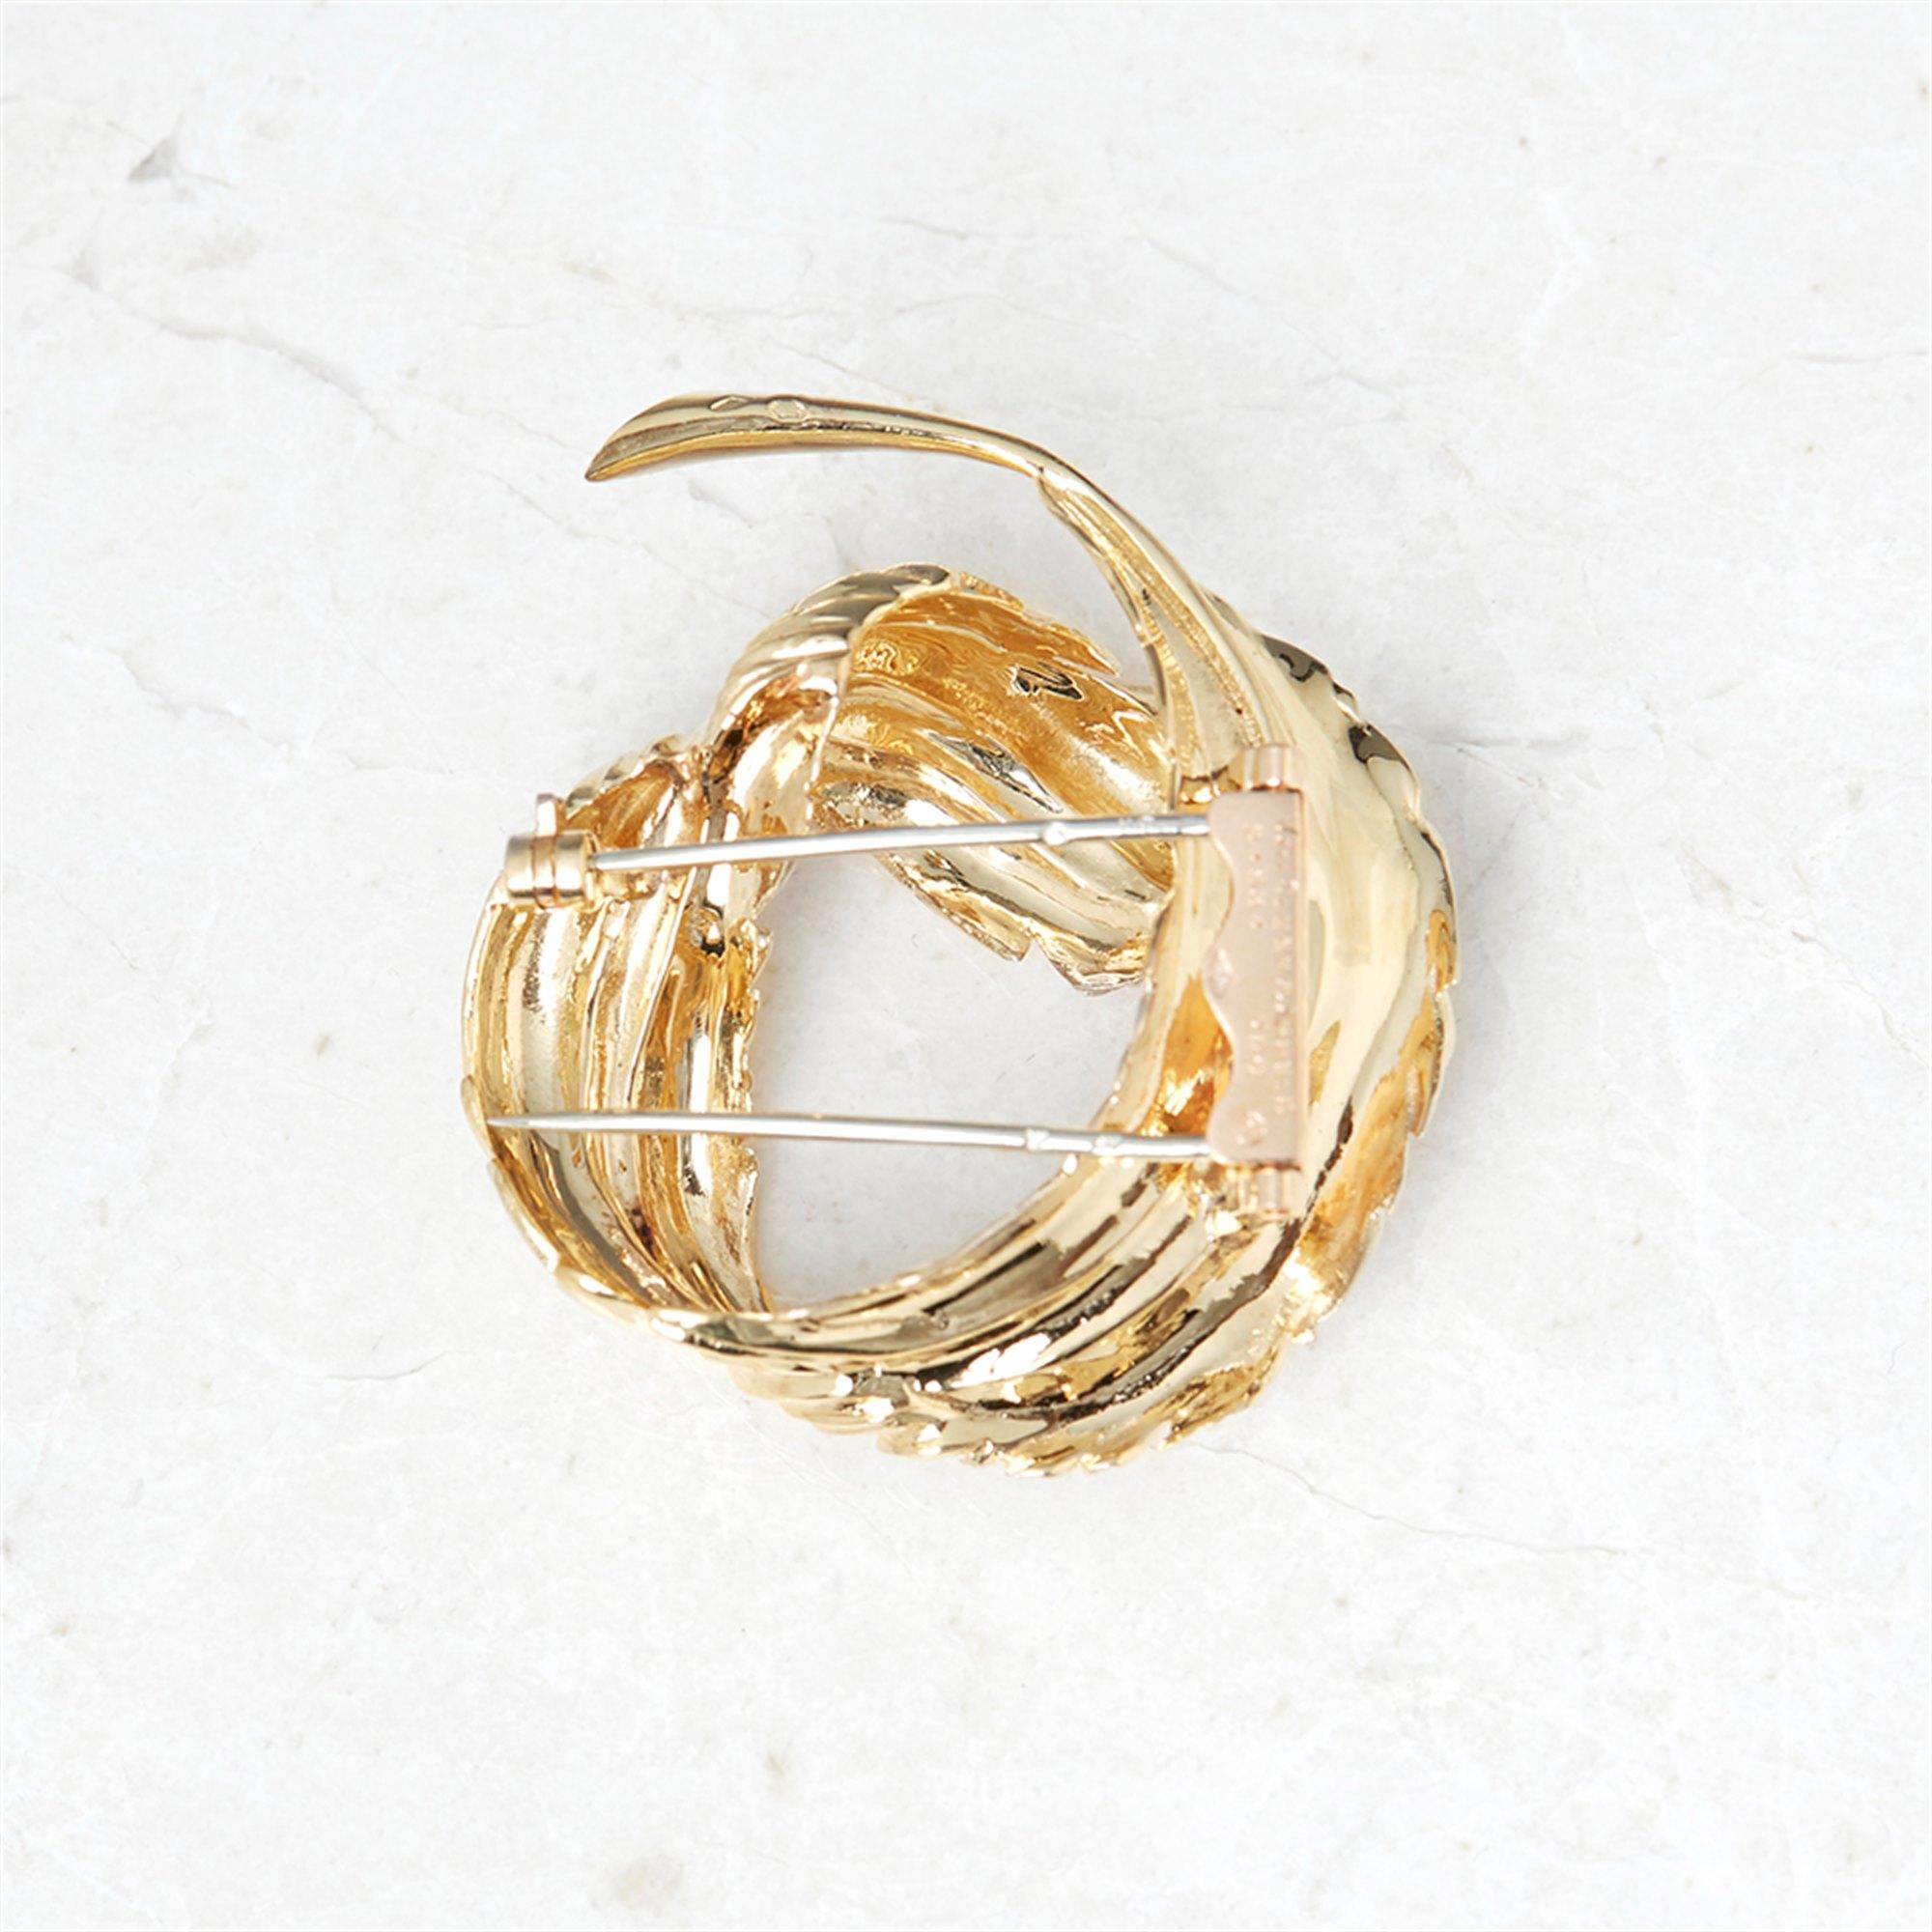 Van Cleef & Arpels 18k Yellow Gold Feather Design Vintage Brooch